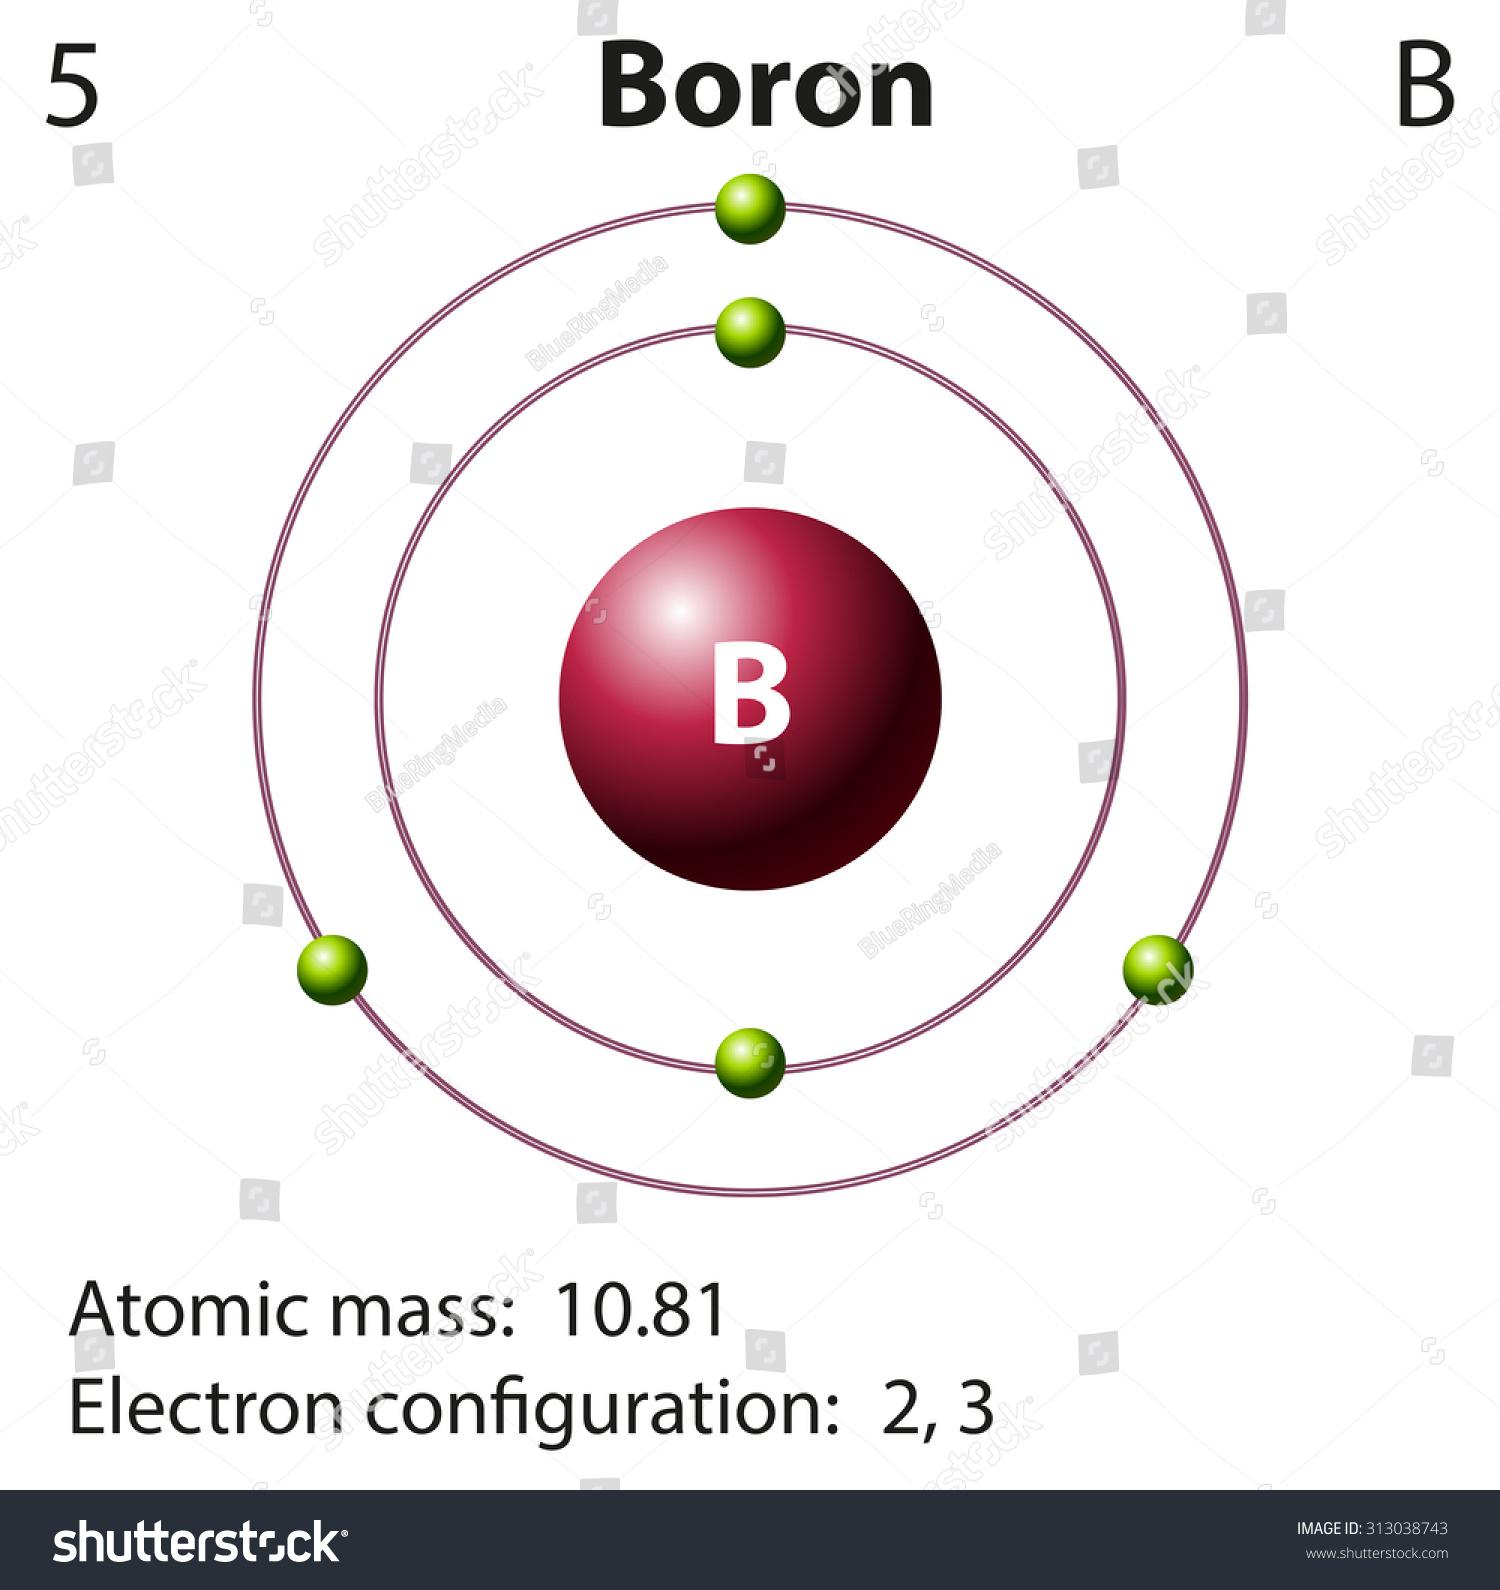 Diagram Representation Element Boron Illustration Stock